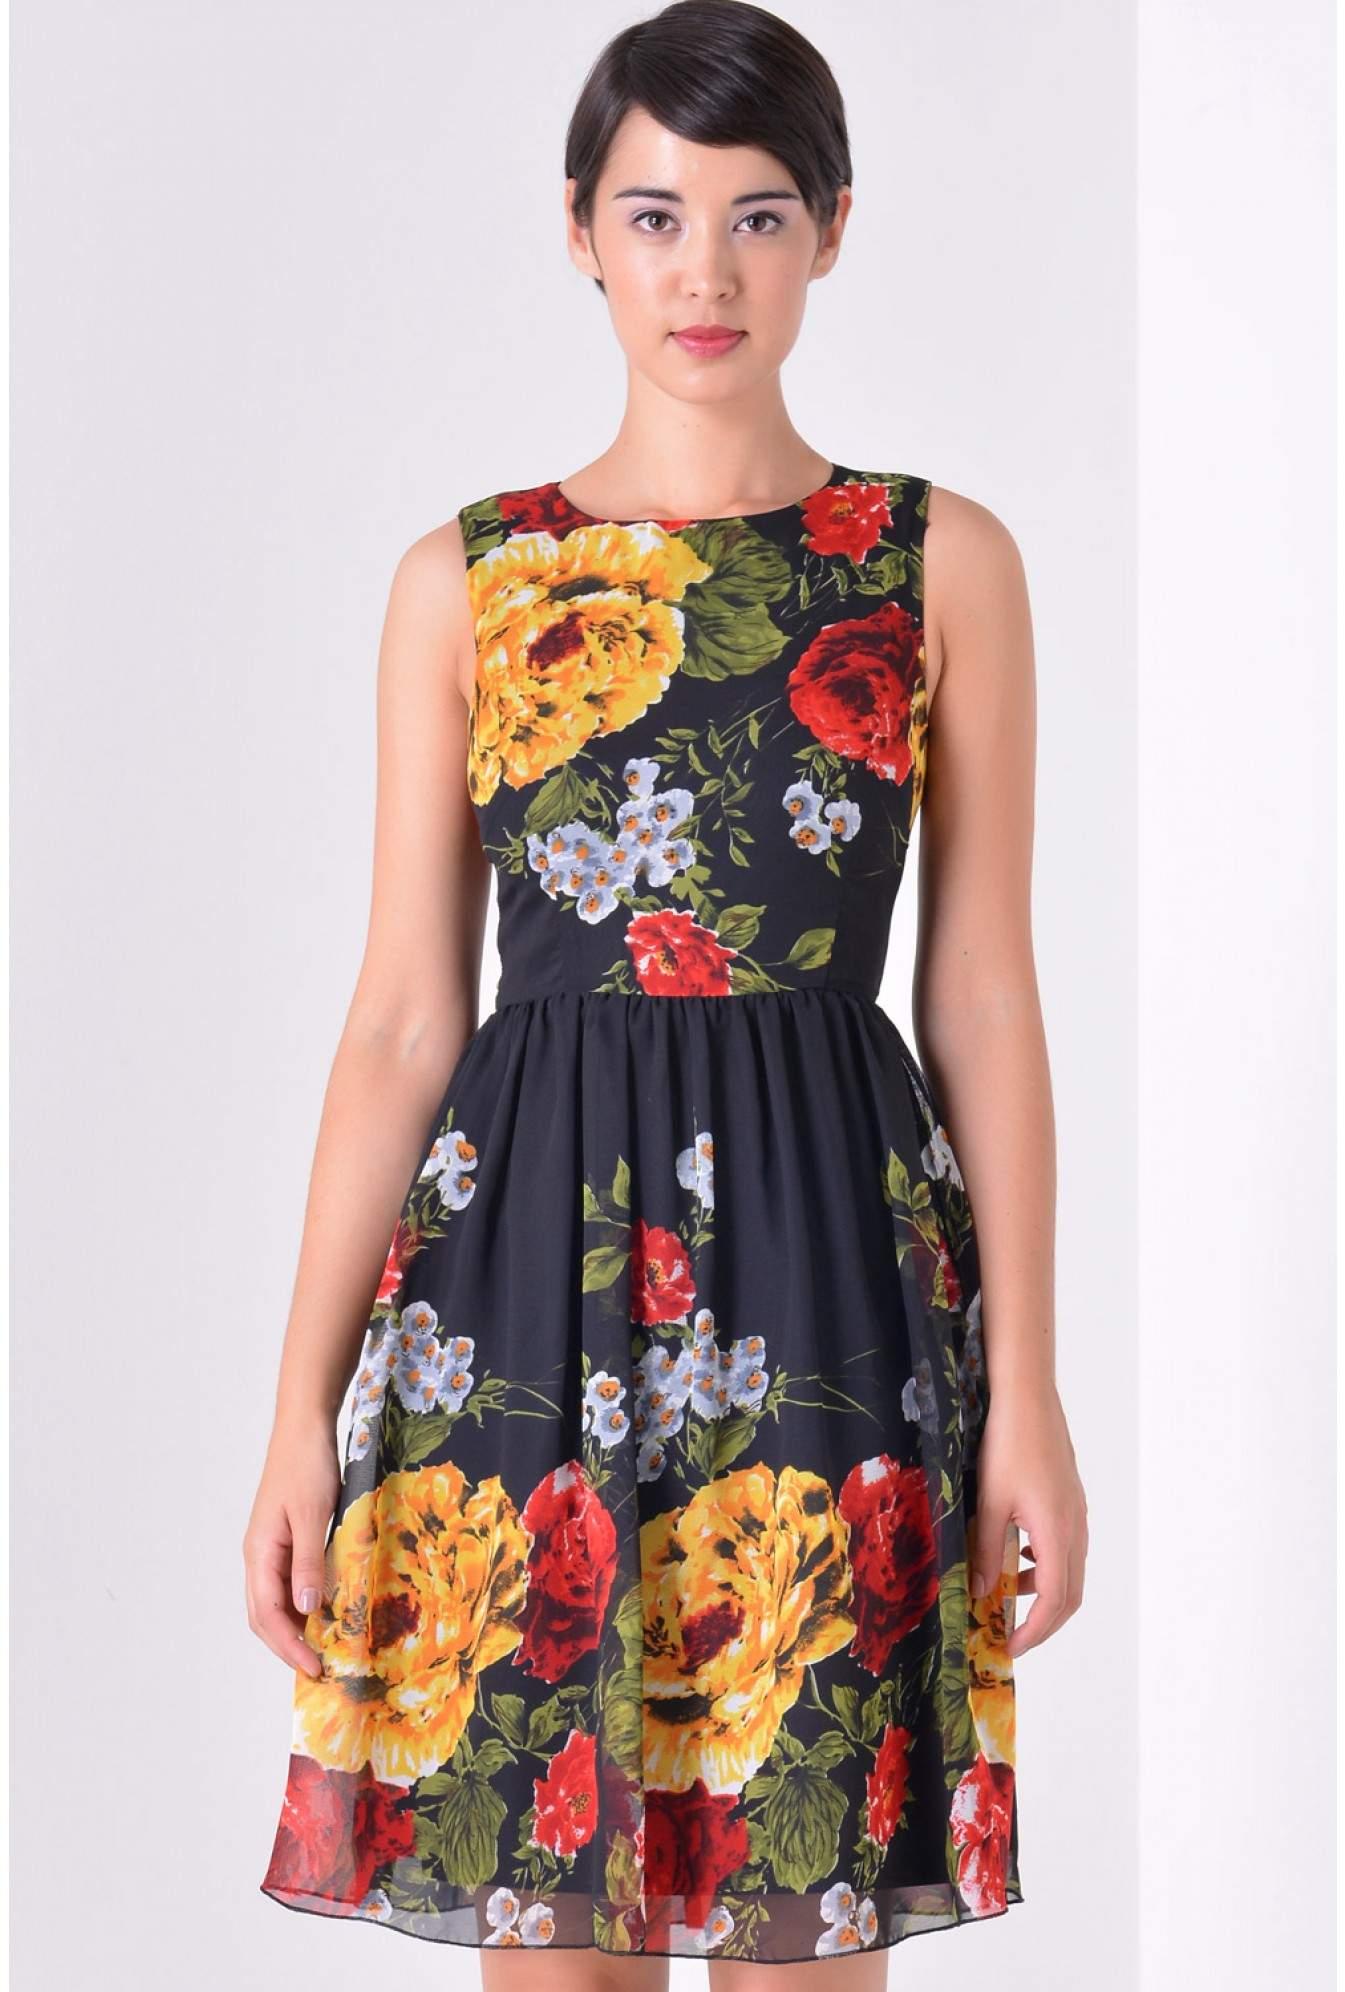 231e85f832d iCLOTHING Lulu Floral Chiffon Dress